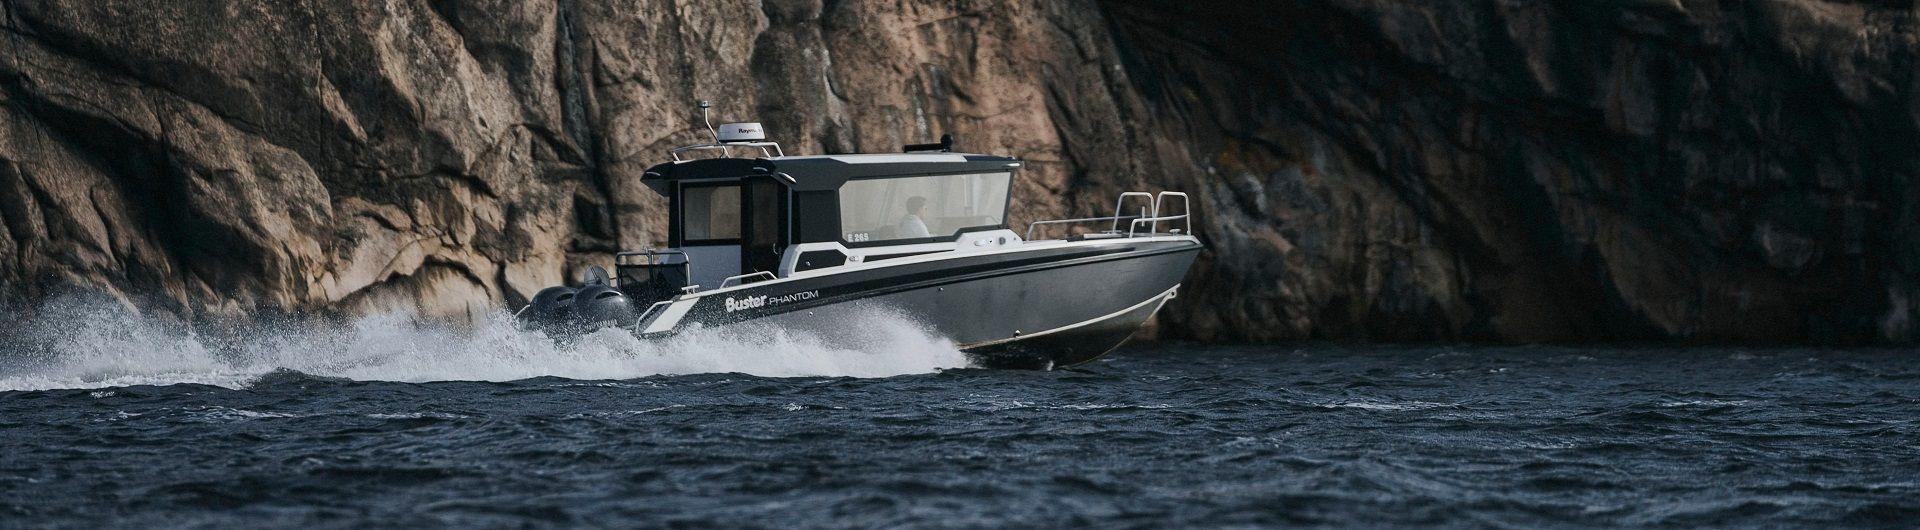 Aluminiumboot Sportboot Buster Phantom Cabin Header